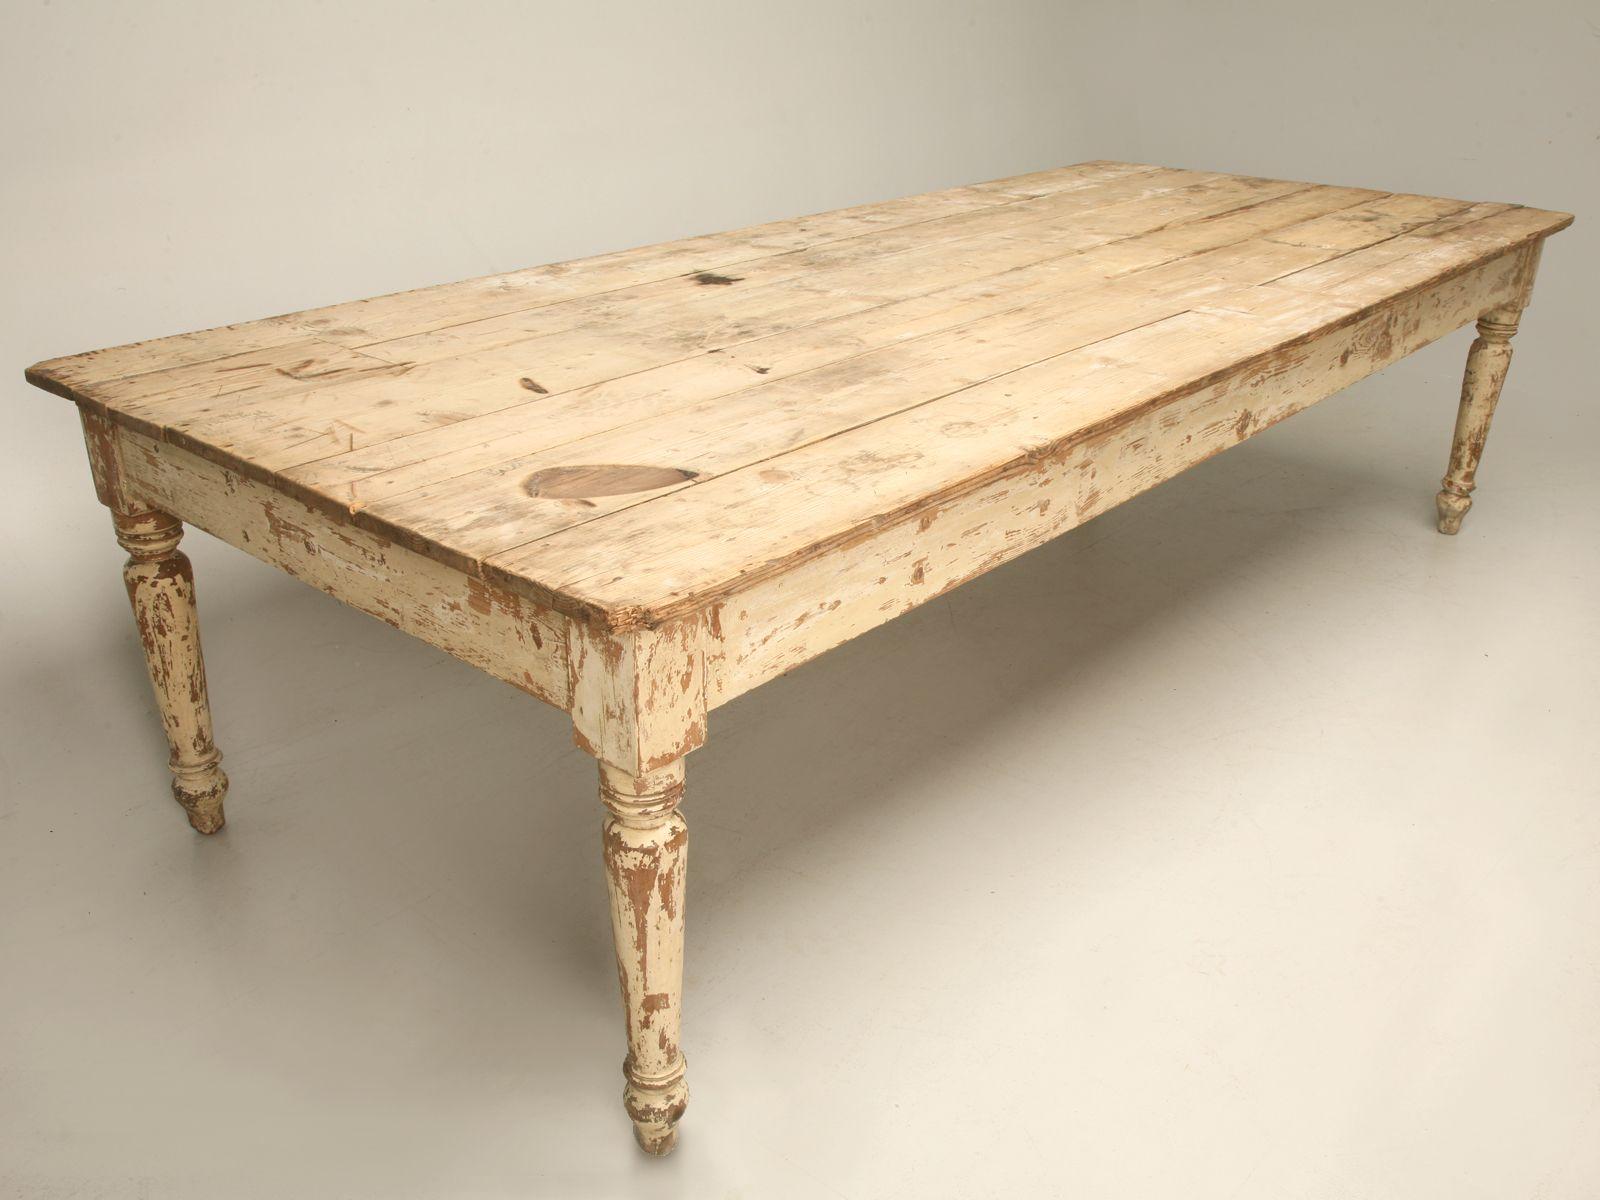 Antique scrubbed pine farm table I N S P I R A T I O N